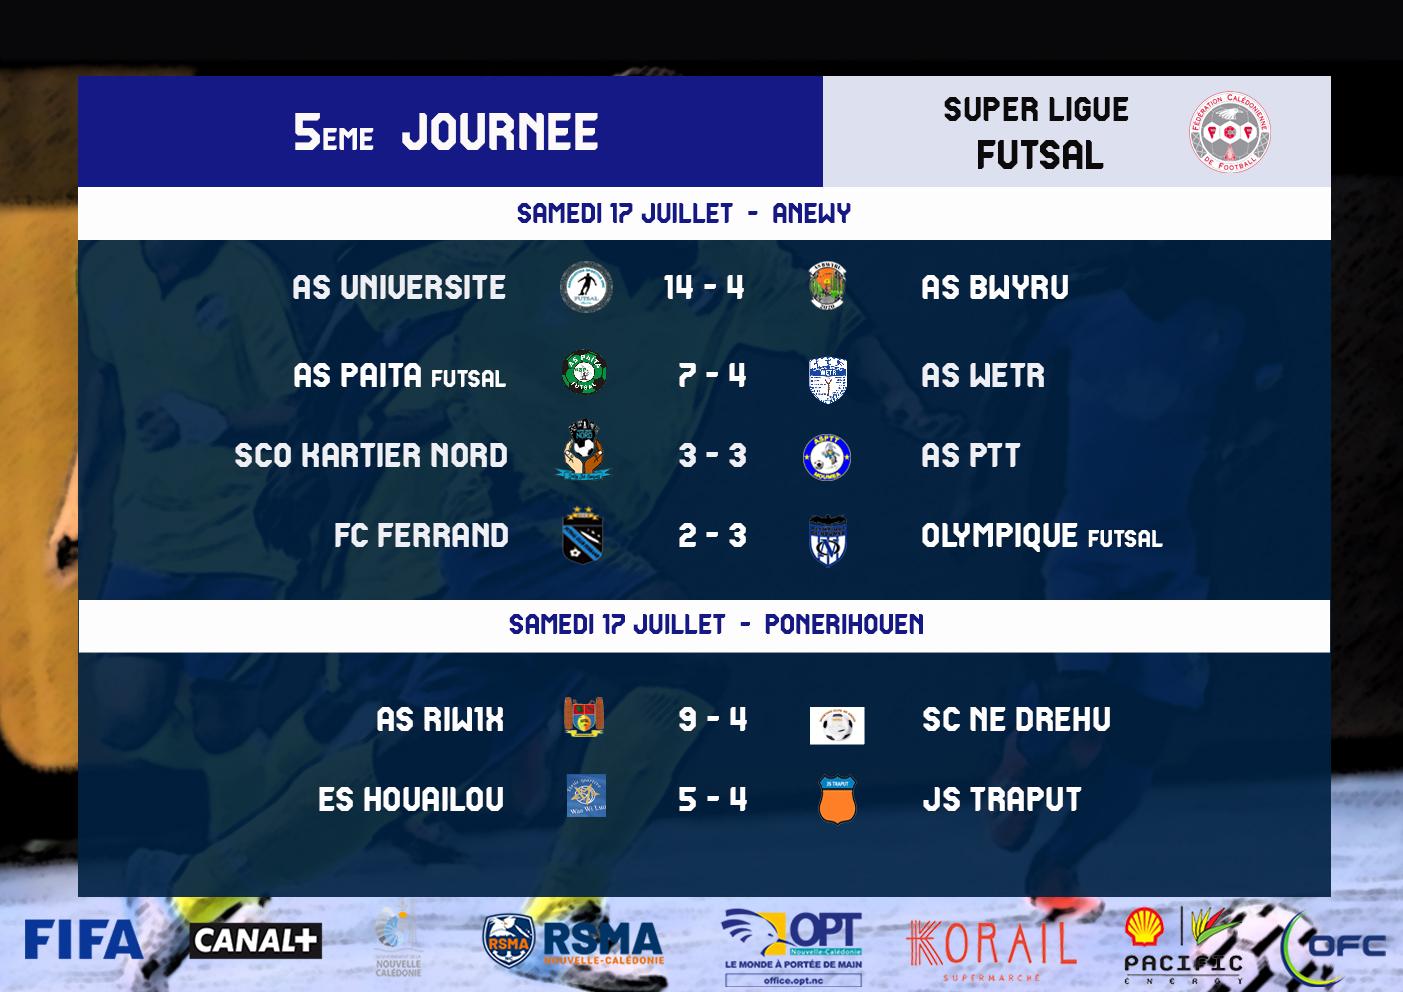 Résultats - Classement / SUPER LIGUE J14 + FUTSAL J5